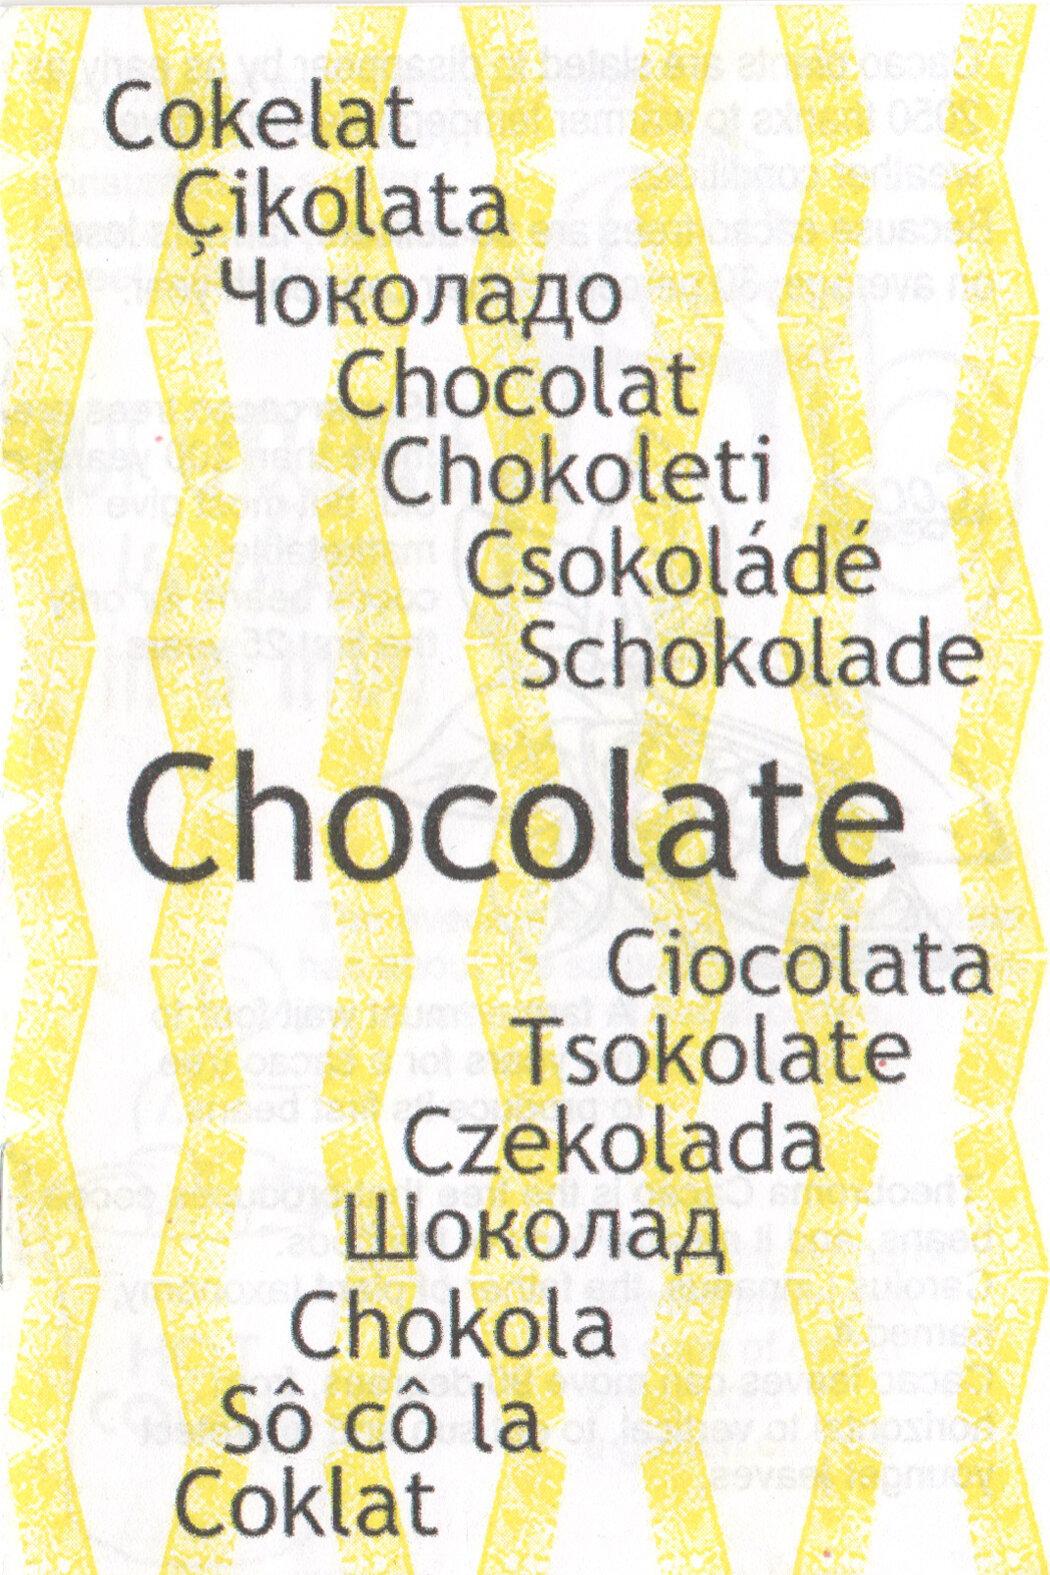 Chocolate_Page_1_Image_0001.jpg